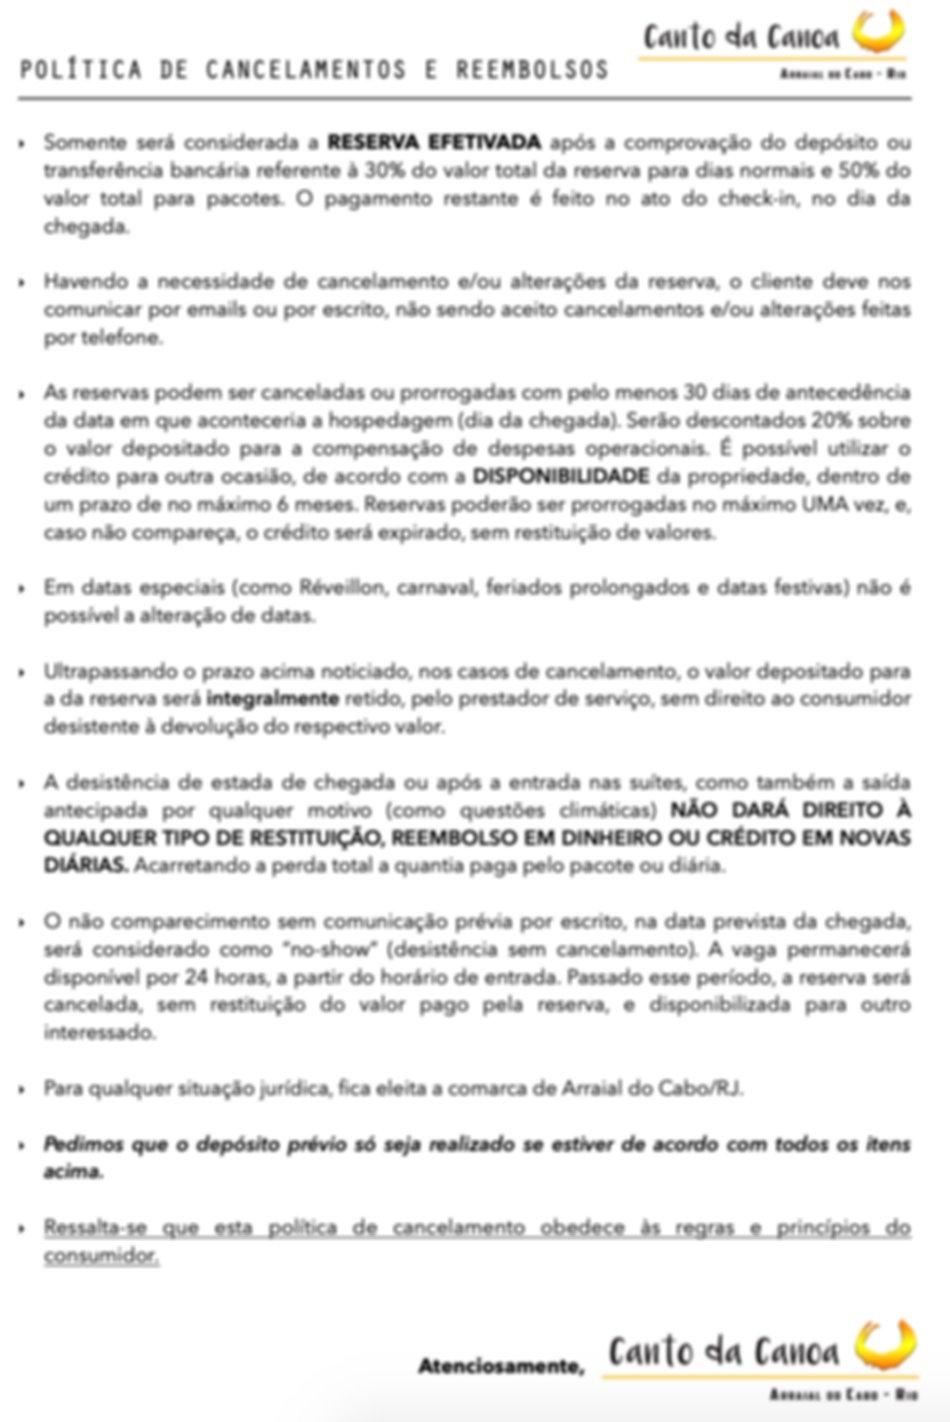 politica de cancelamentos e reembolsos.j